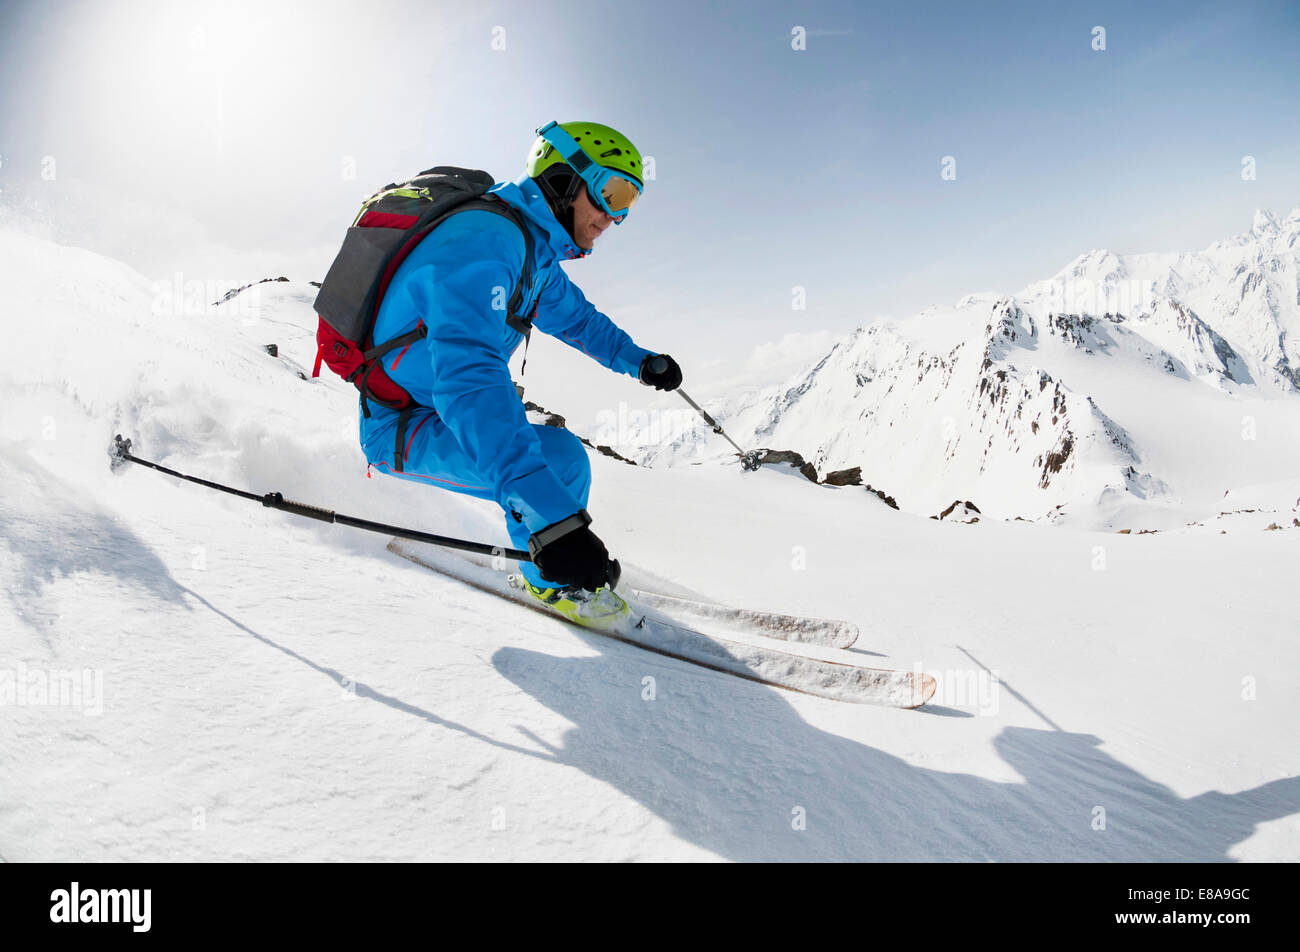 Man skier skiing downhill steep slope Alps - Stock Image